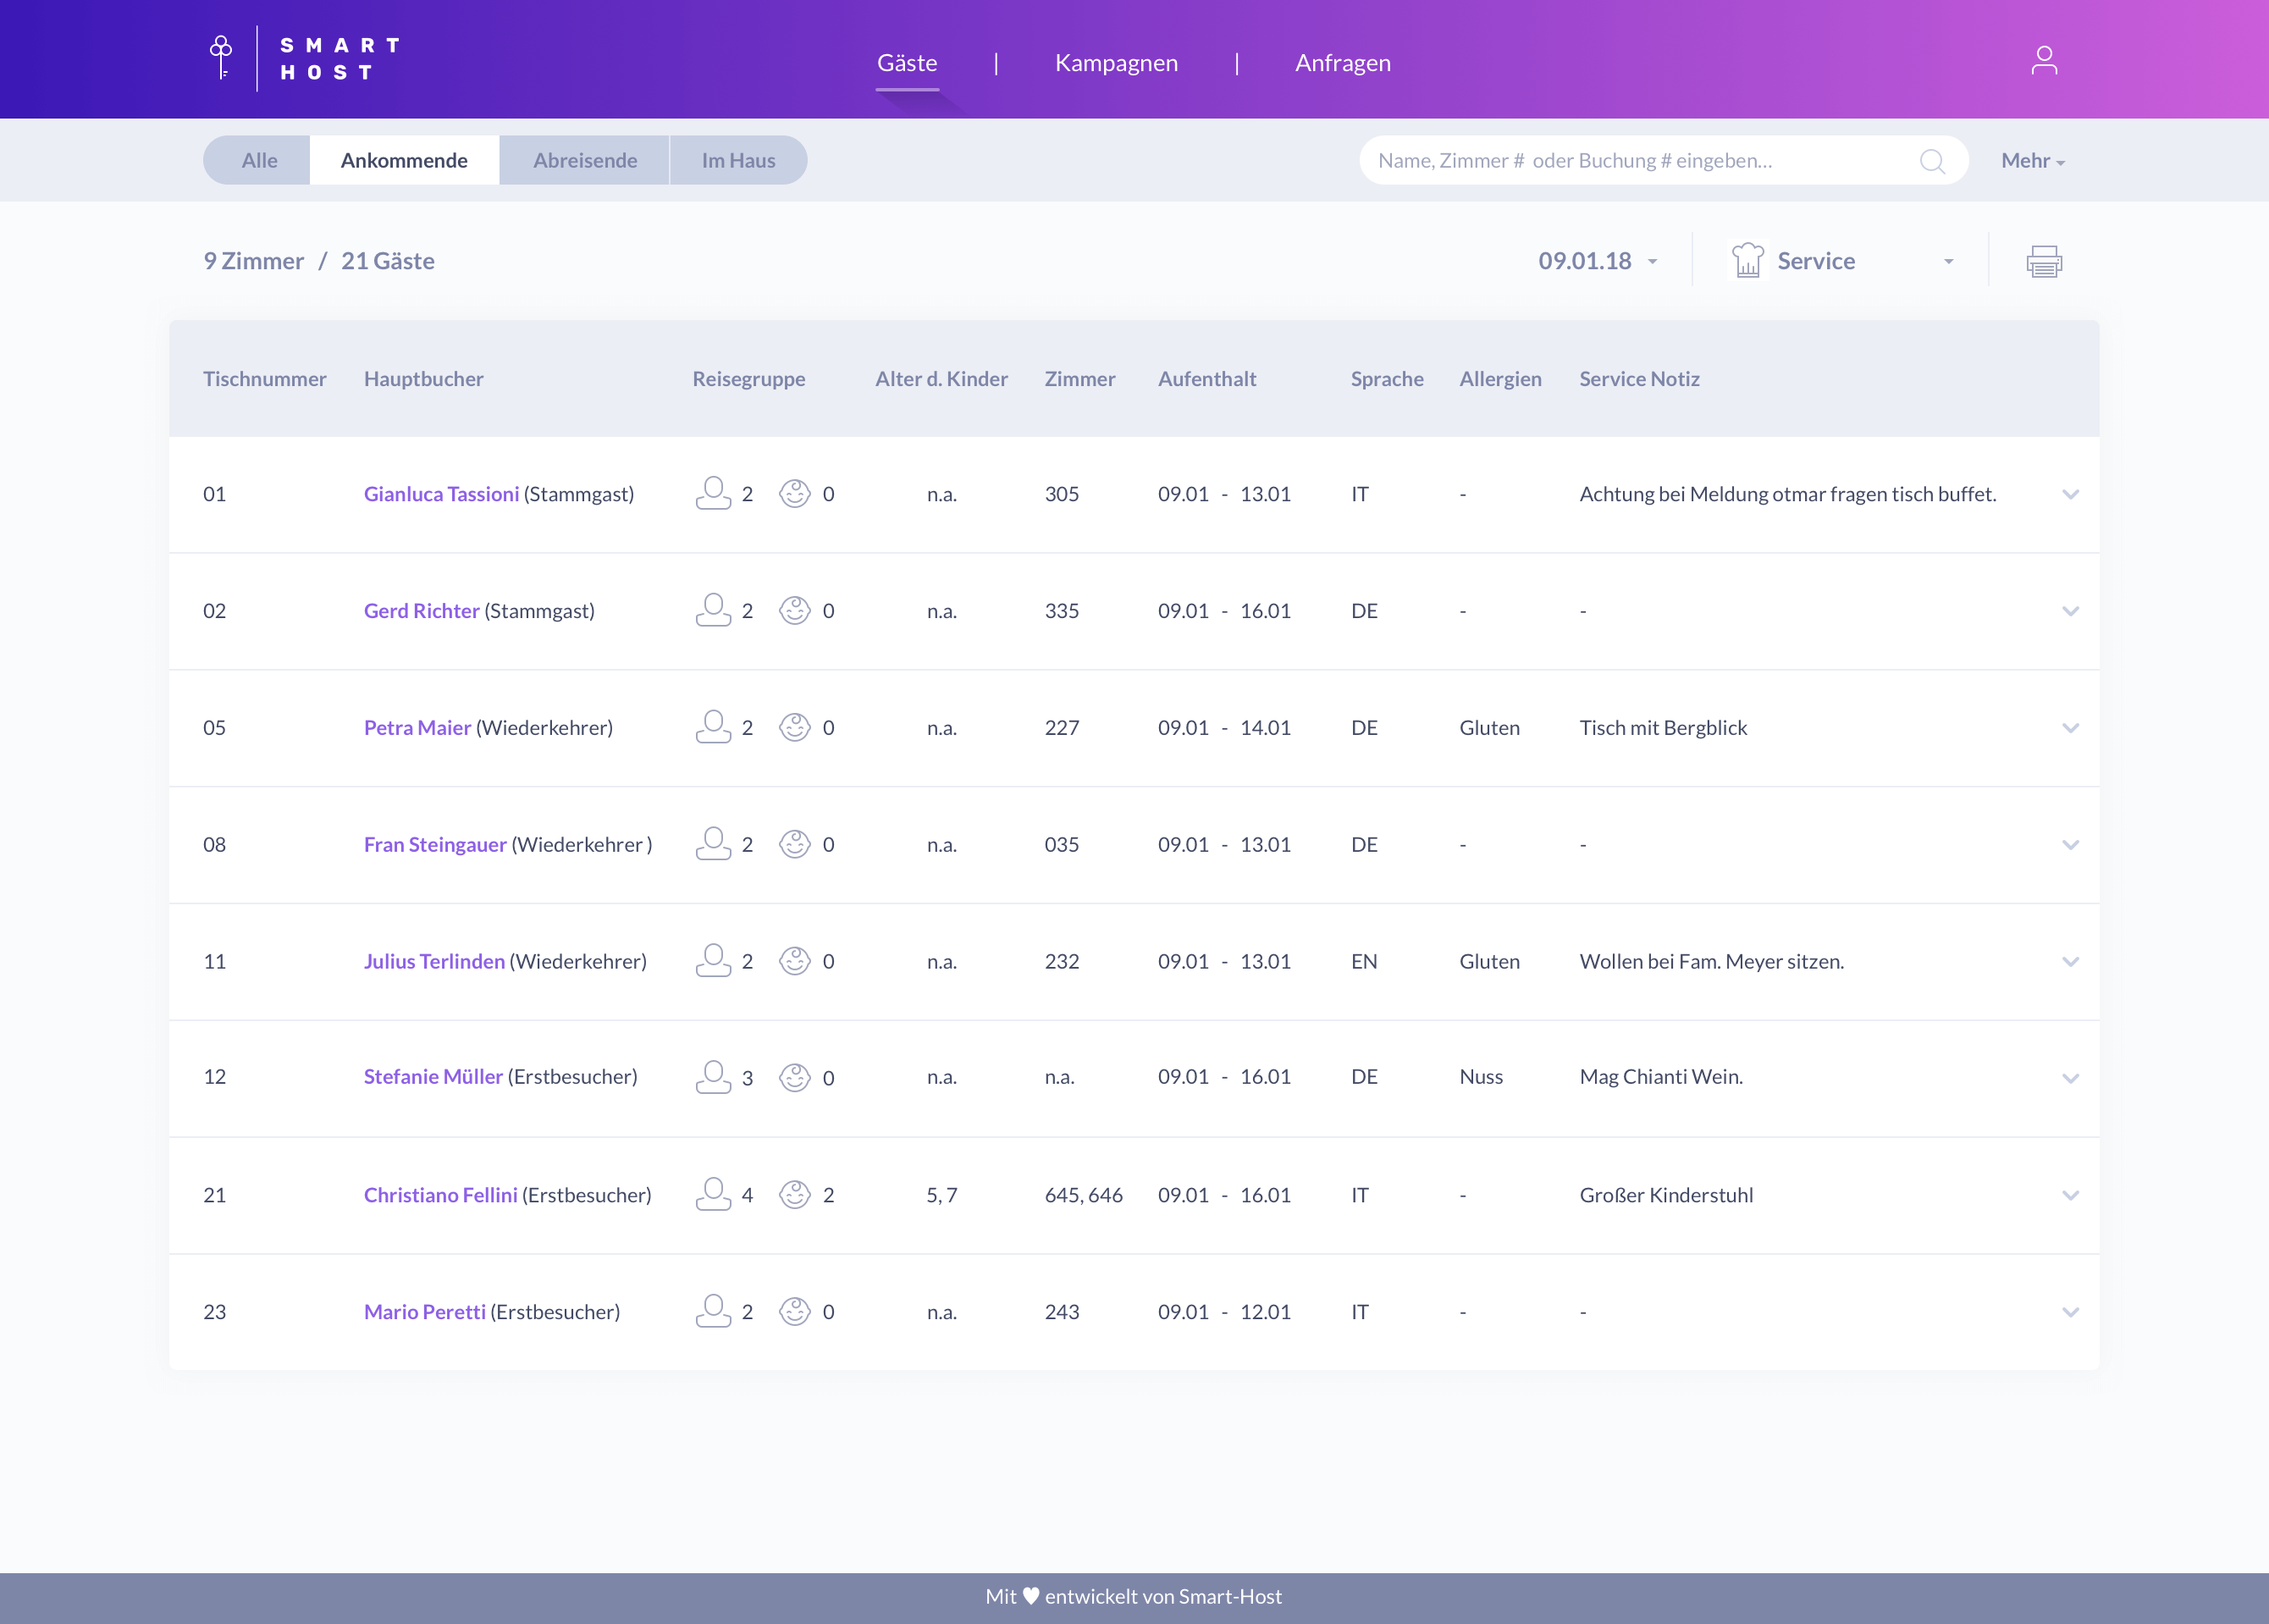 Guests Management screen